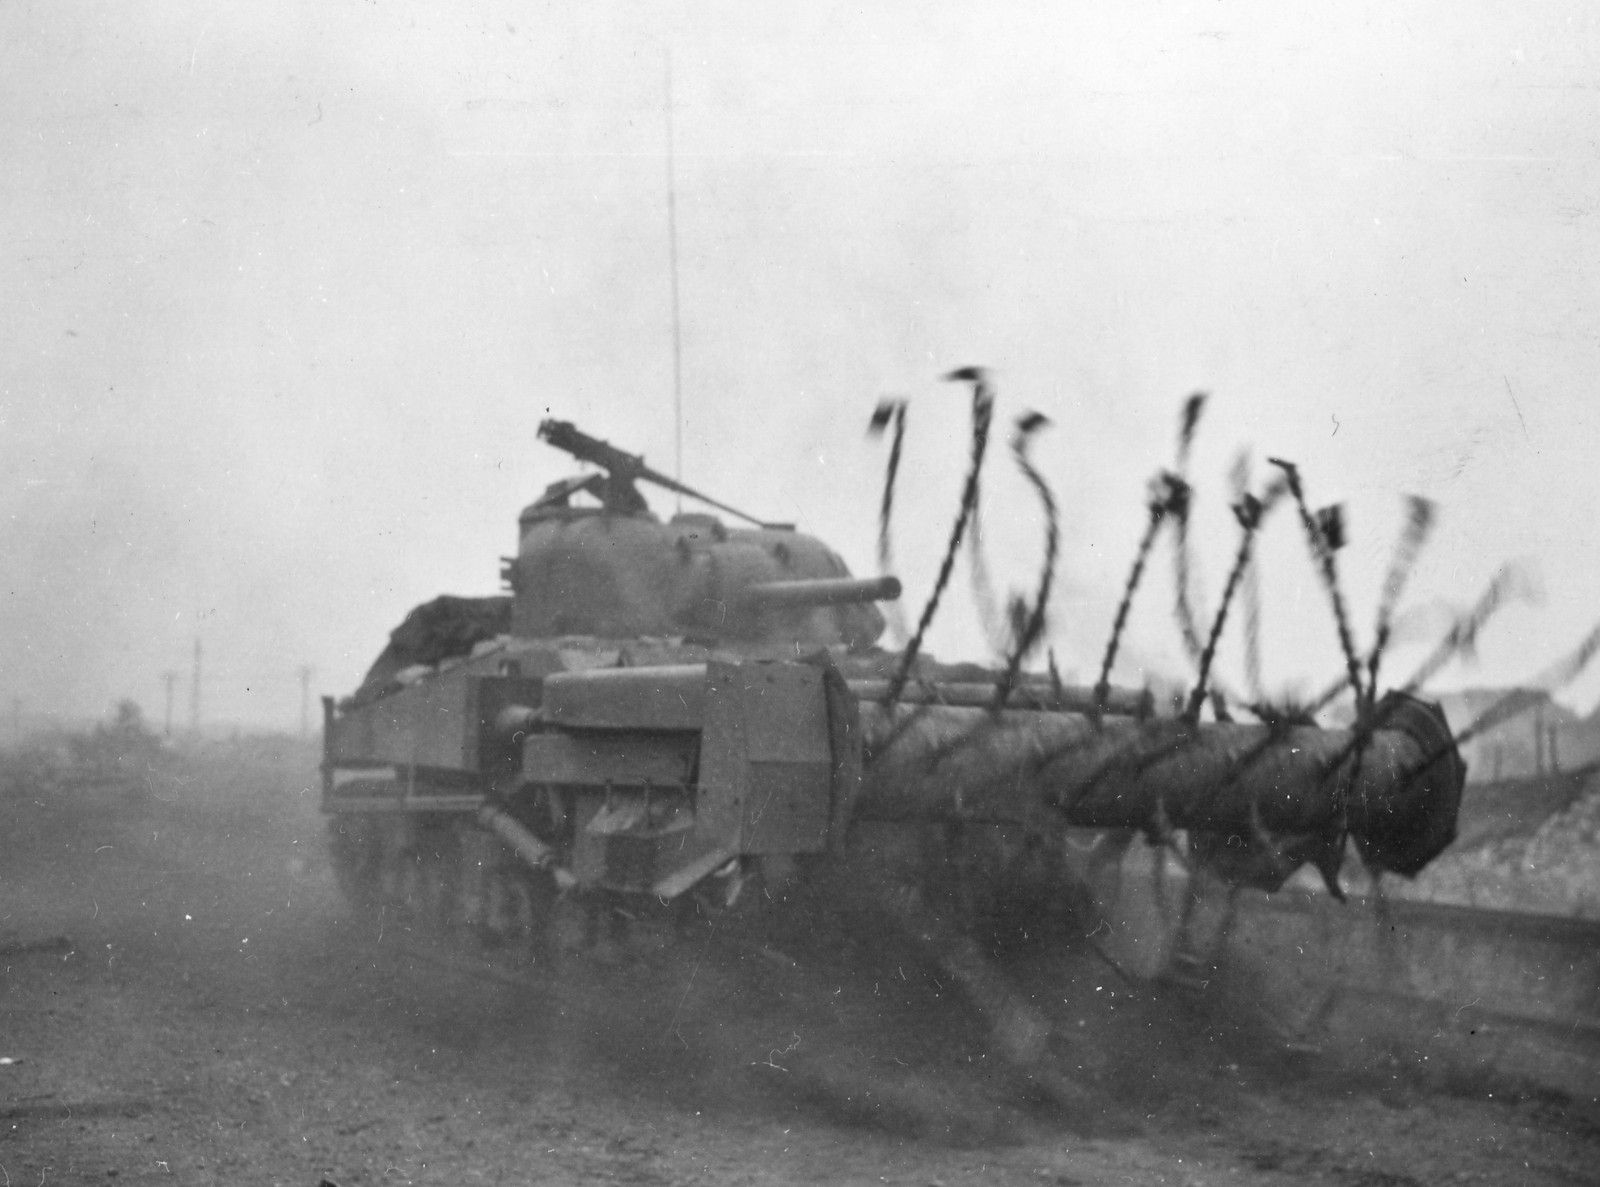 M4Sherman_Flail_Tank_Breinig_1944